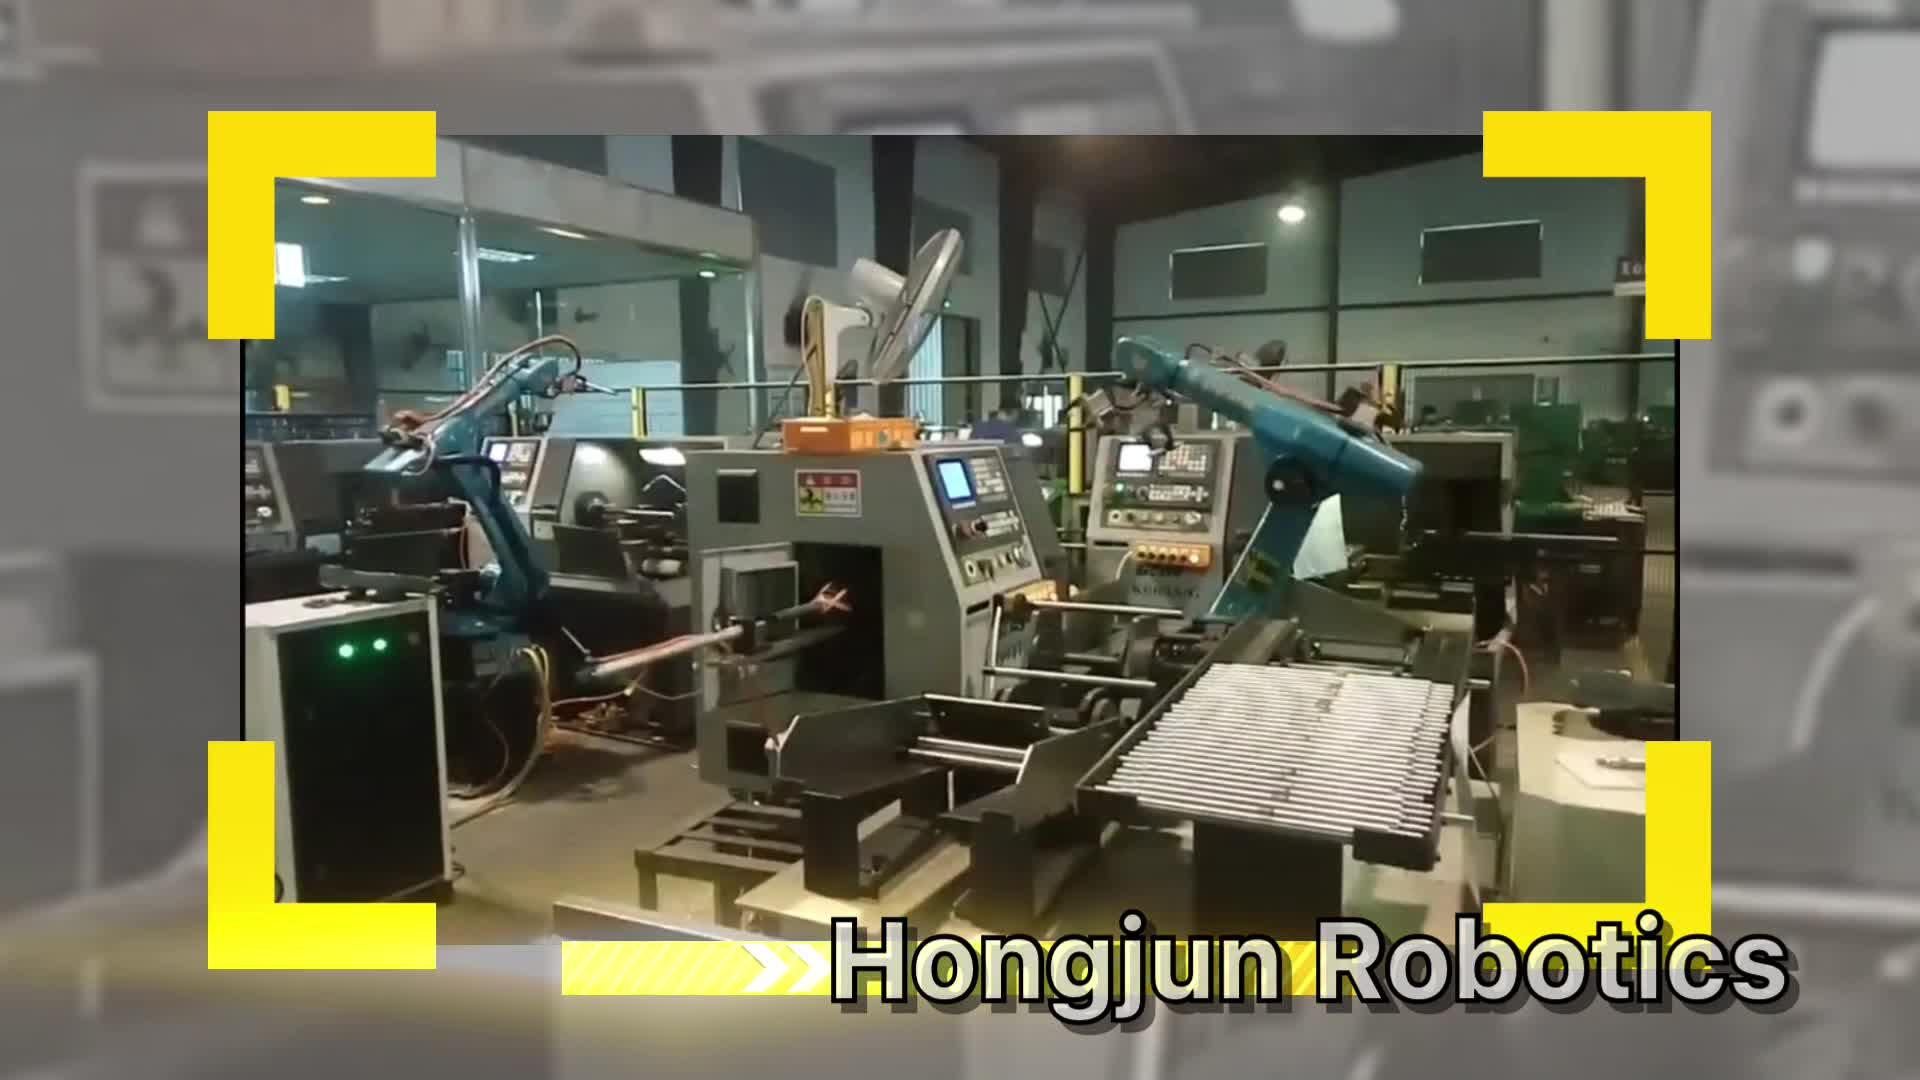 CNC industriale di Saldatura Robot/Braccio Robotico 6 Assi Con Servo Motore